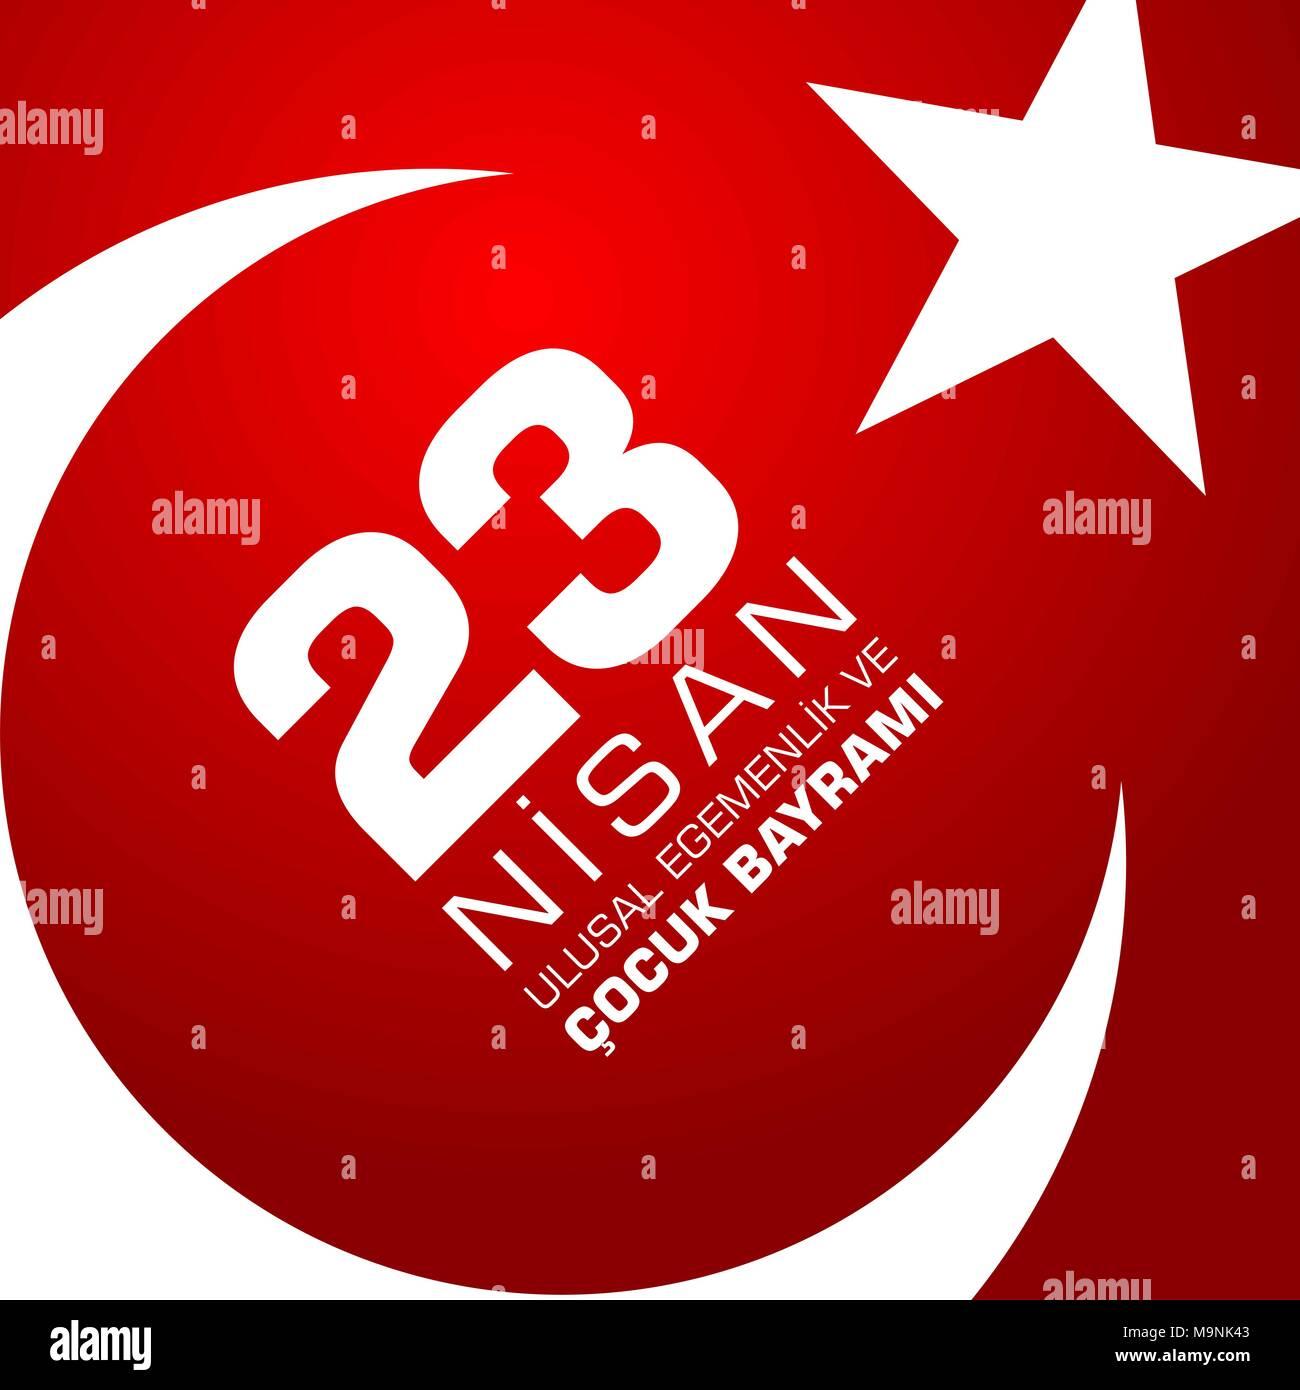 23 nisan cocuk baryrami. Translation: Turkish April 23 Childrens Day. Vector illustration Stock Vector